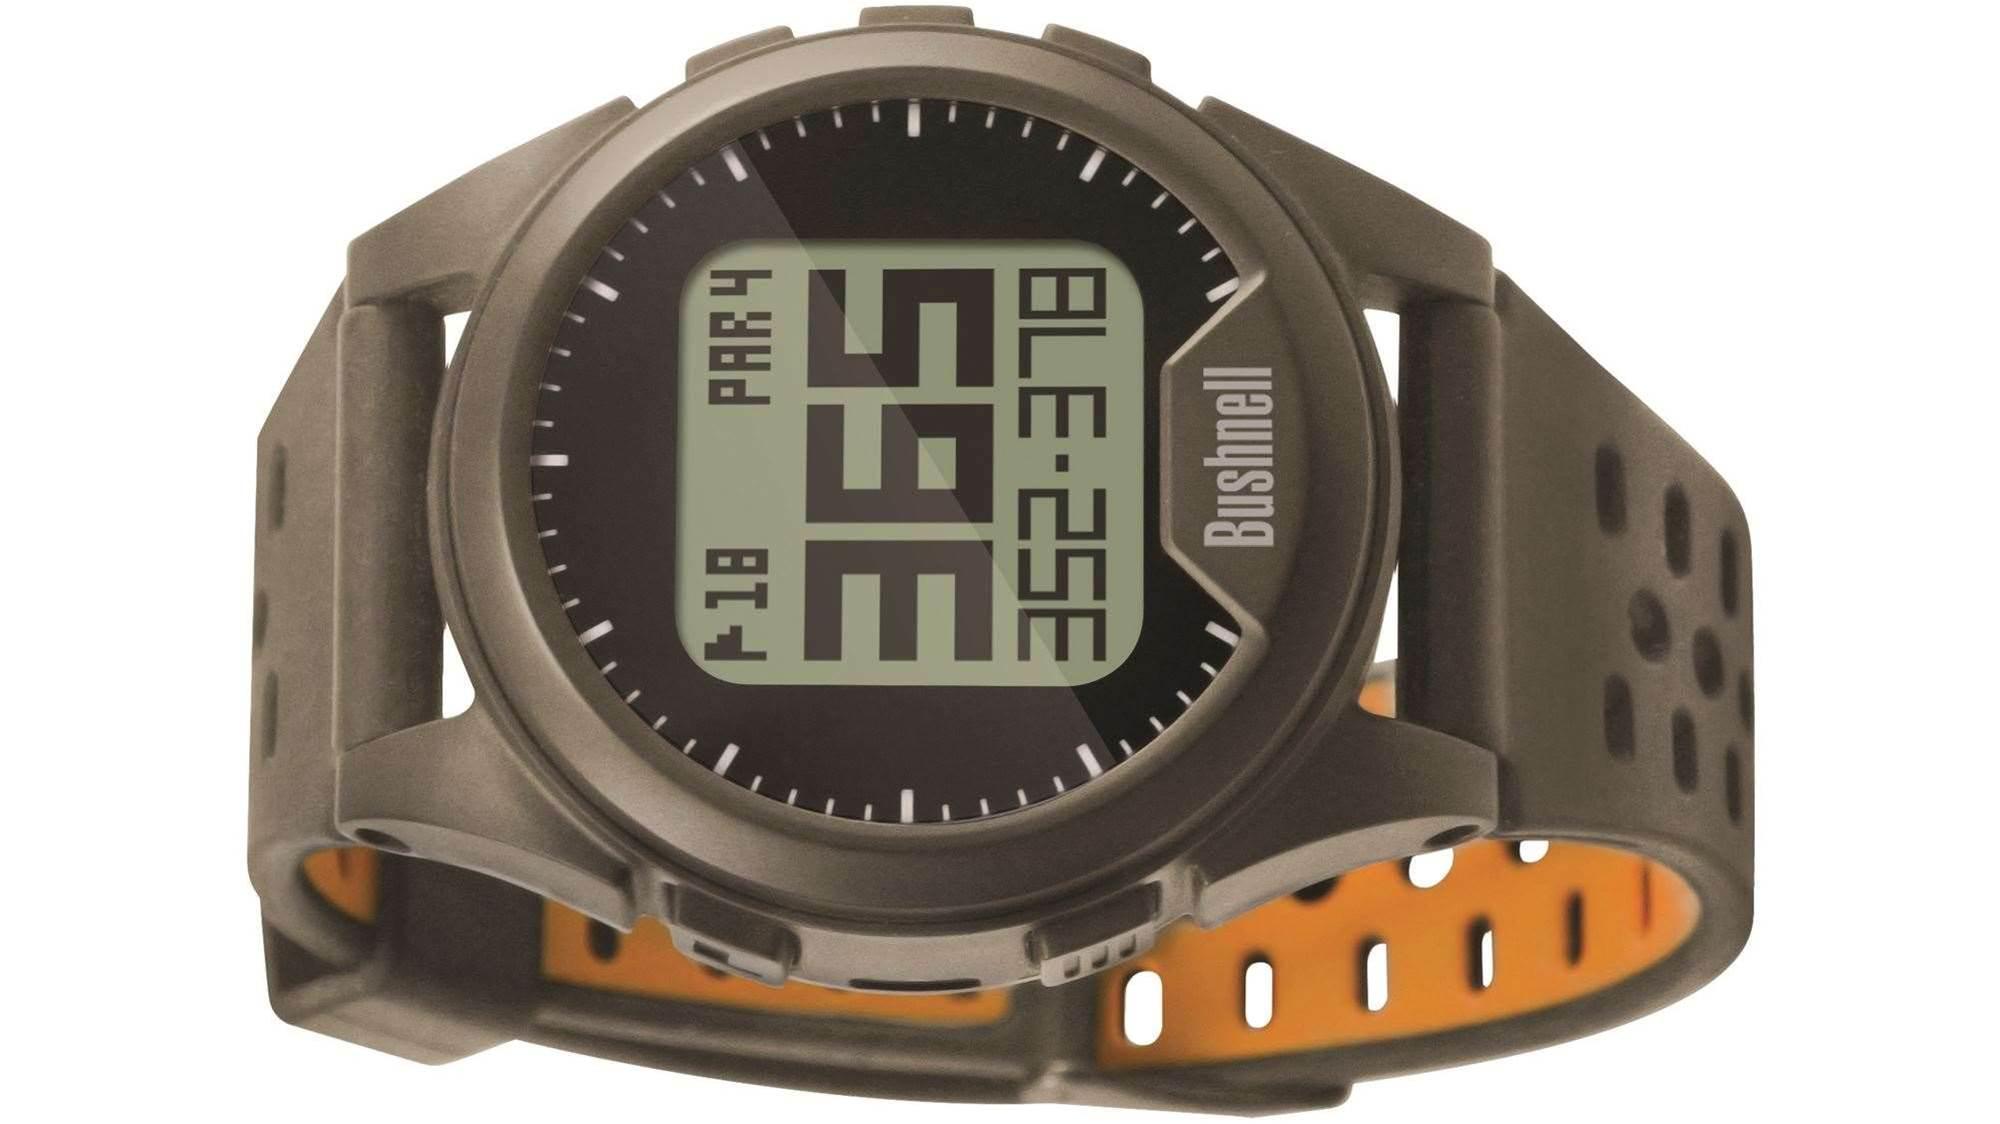 TESTED: Bushnell Neo iON GPS rangefinder watch